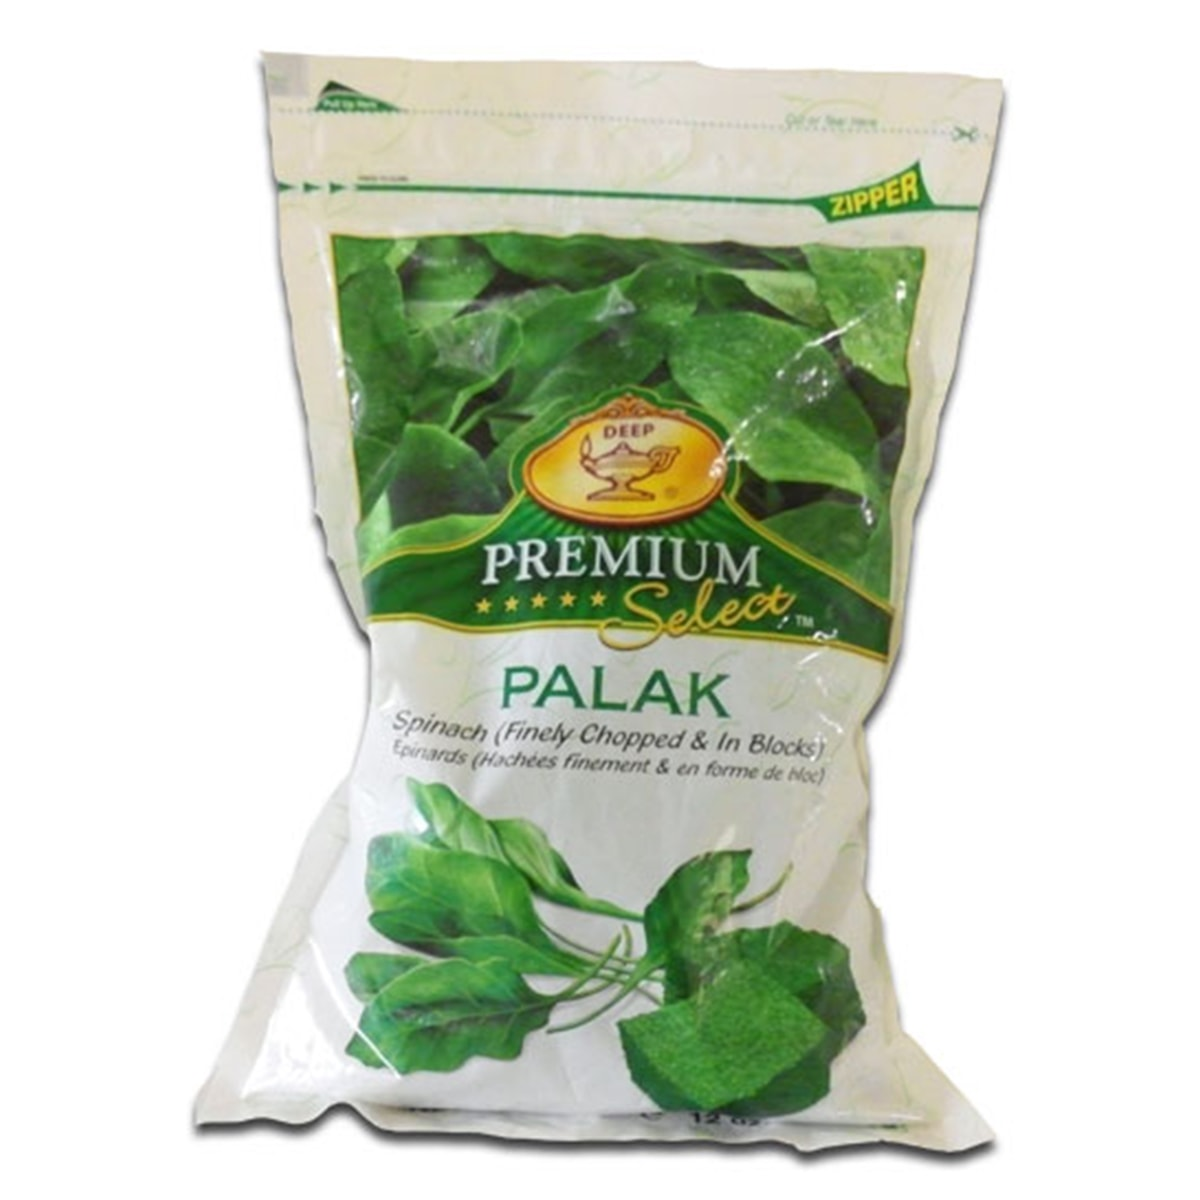 Buy Deep Foods Palak (Spinach) Frozen - 340 gm